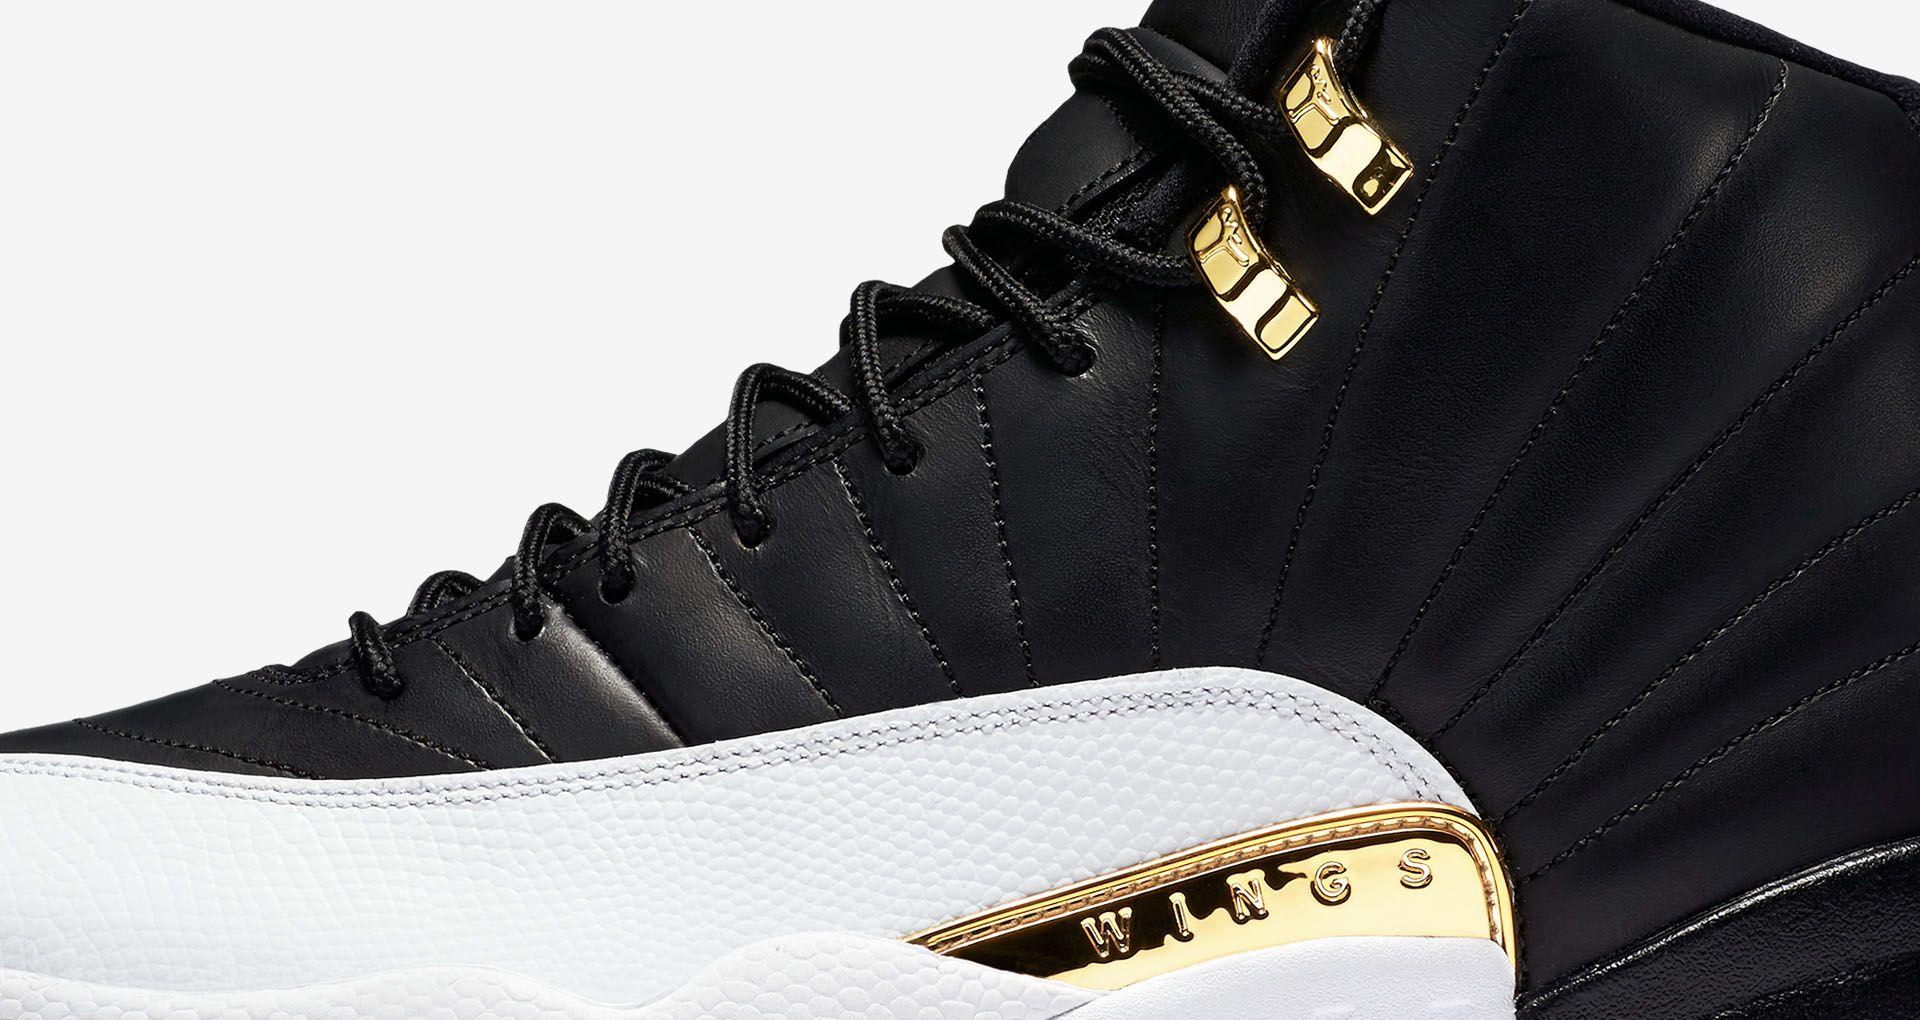 93a73a04afeb Air Jordan 12 Retro  Wings  Release Date. Nike+ SNKRS